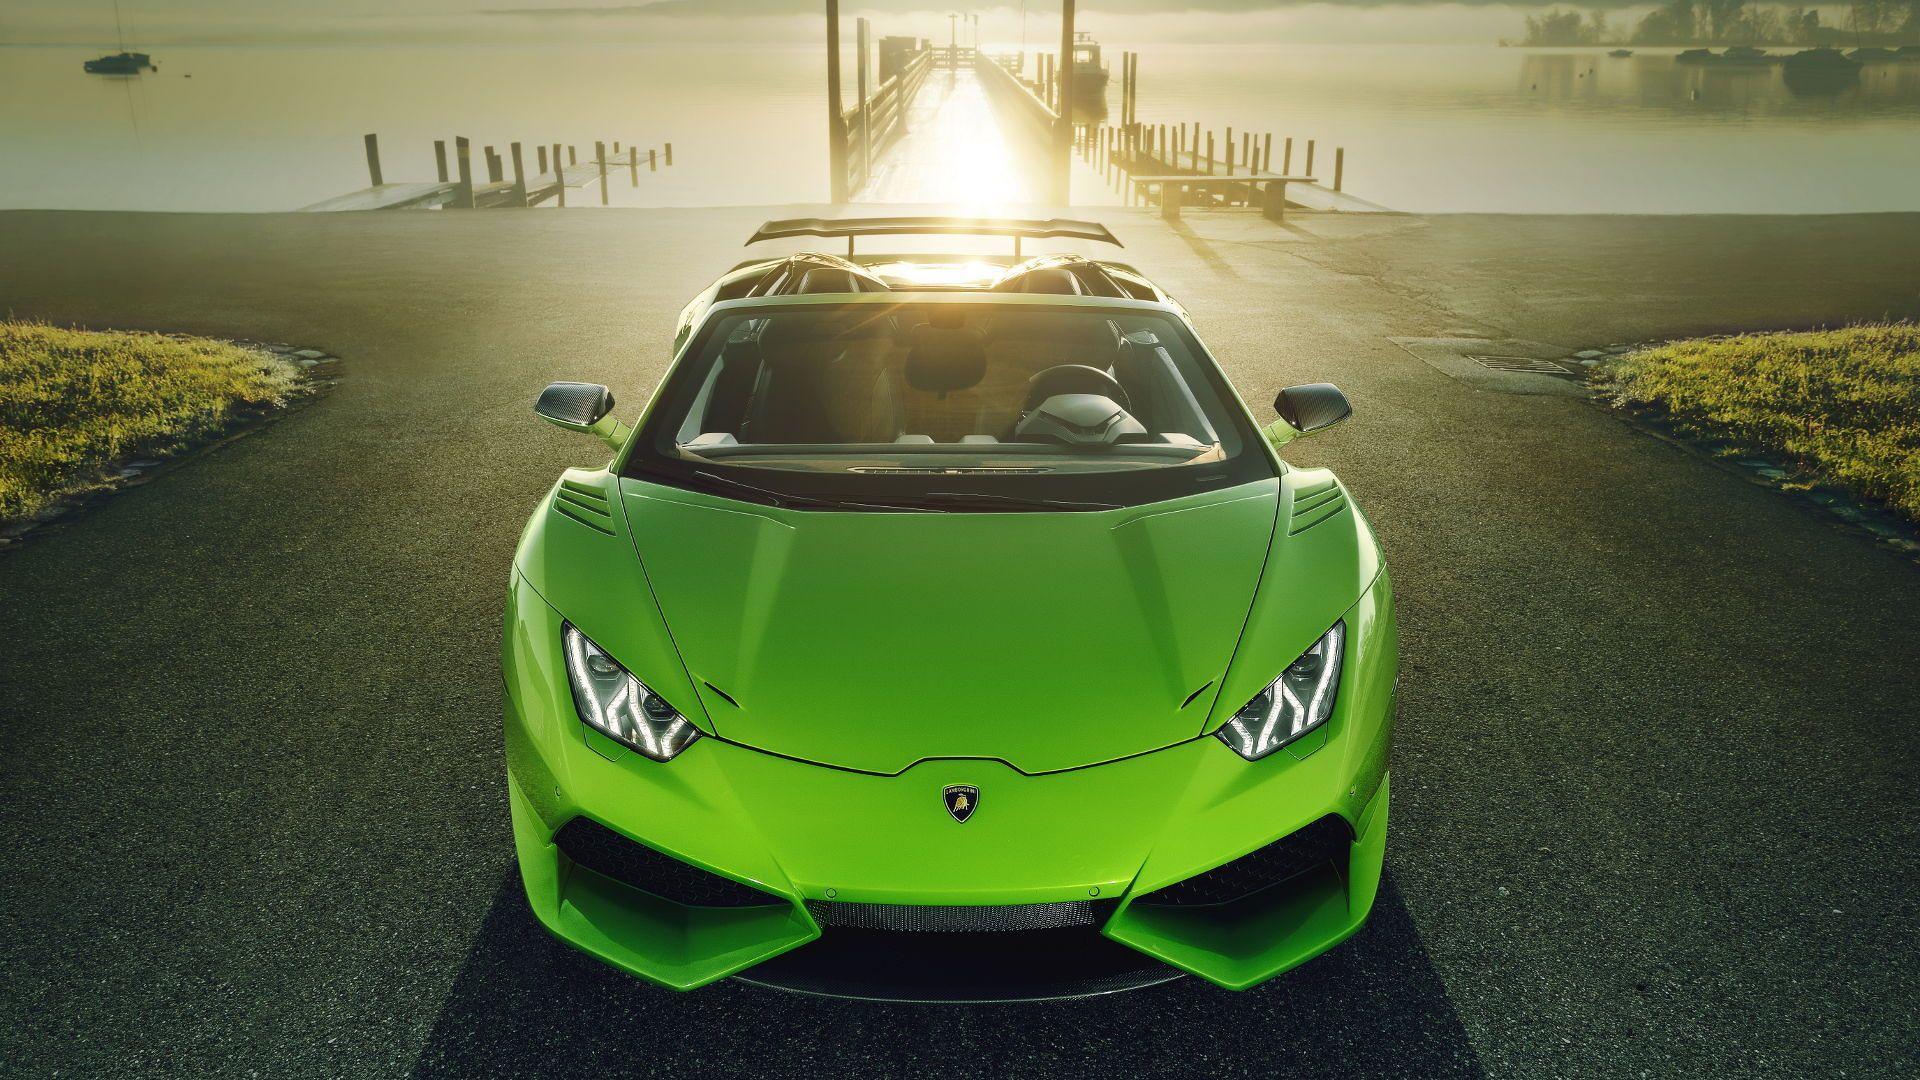 Lamborghini Huracan Spyder by Novitec (3)